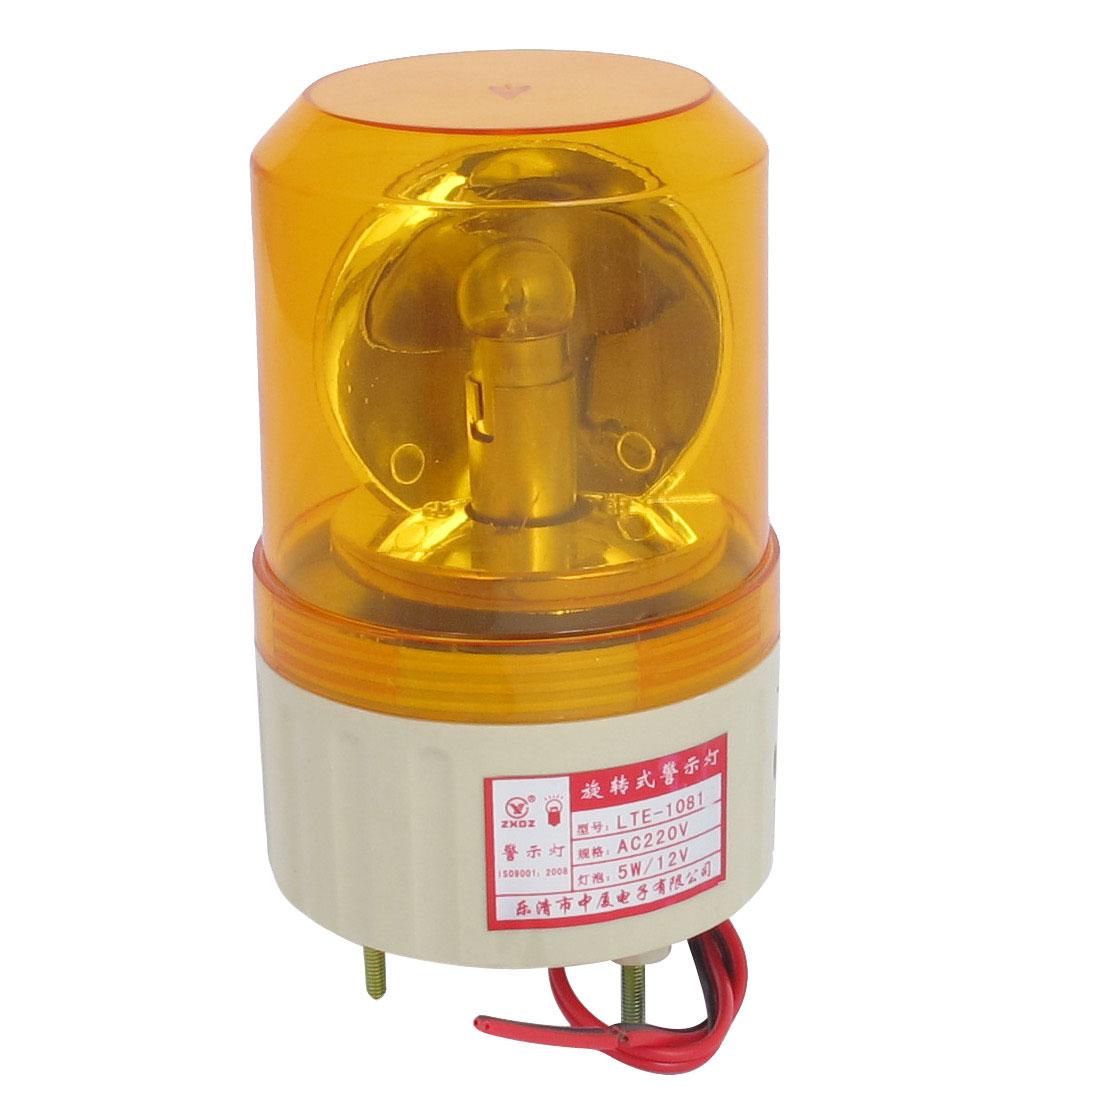 AC 220V Industrial Alarm System Rotating Warning Light Lamp Orange